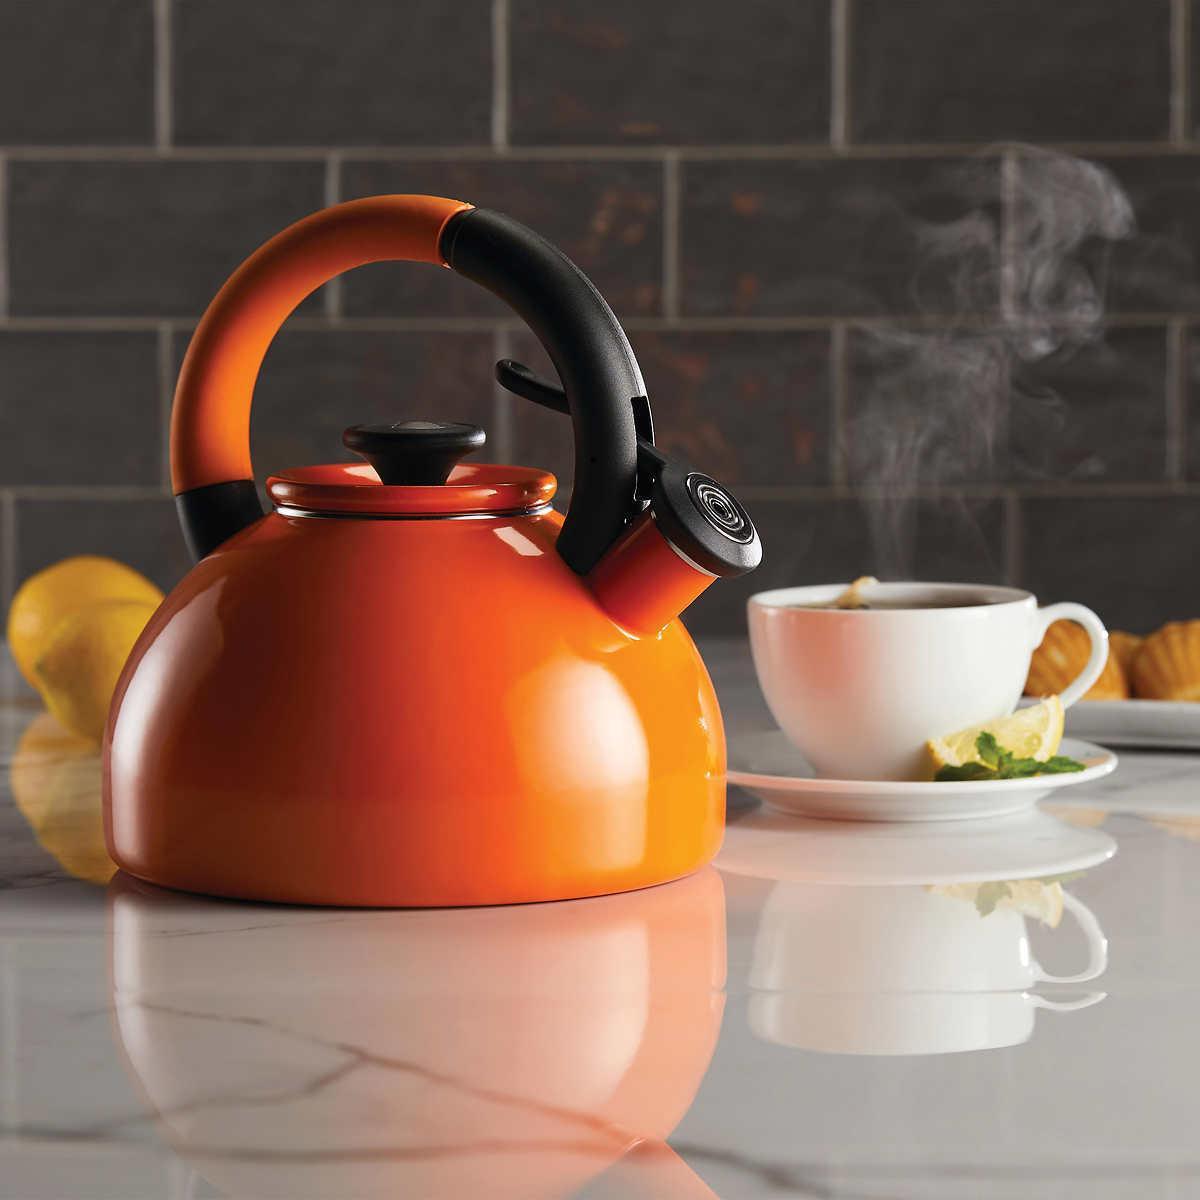 Tea Induction 2-quart Brew Whistling